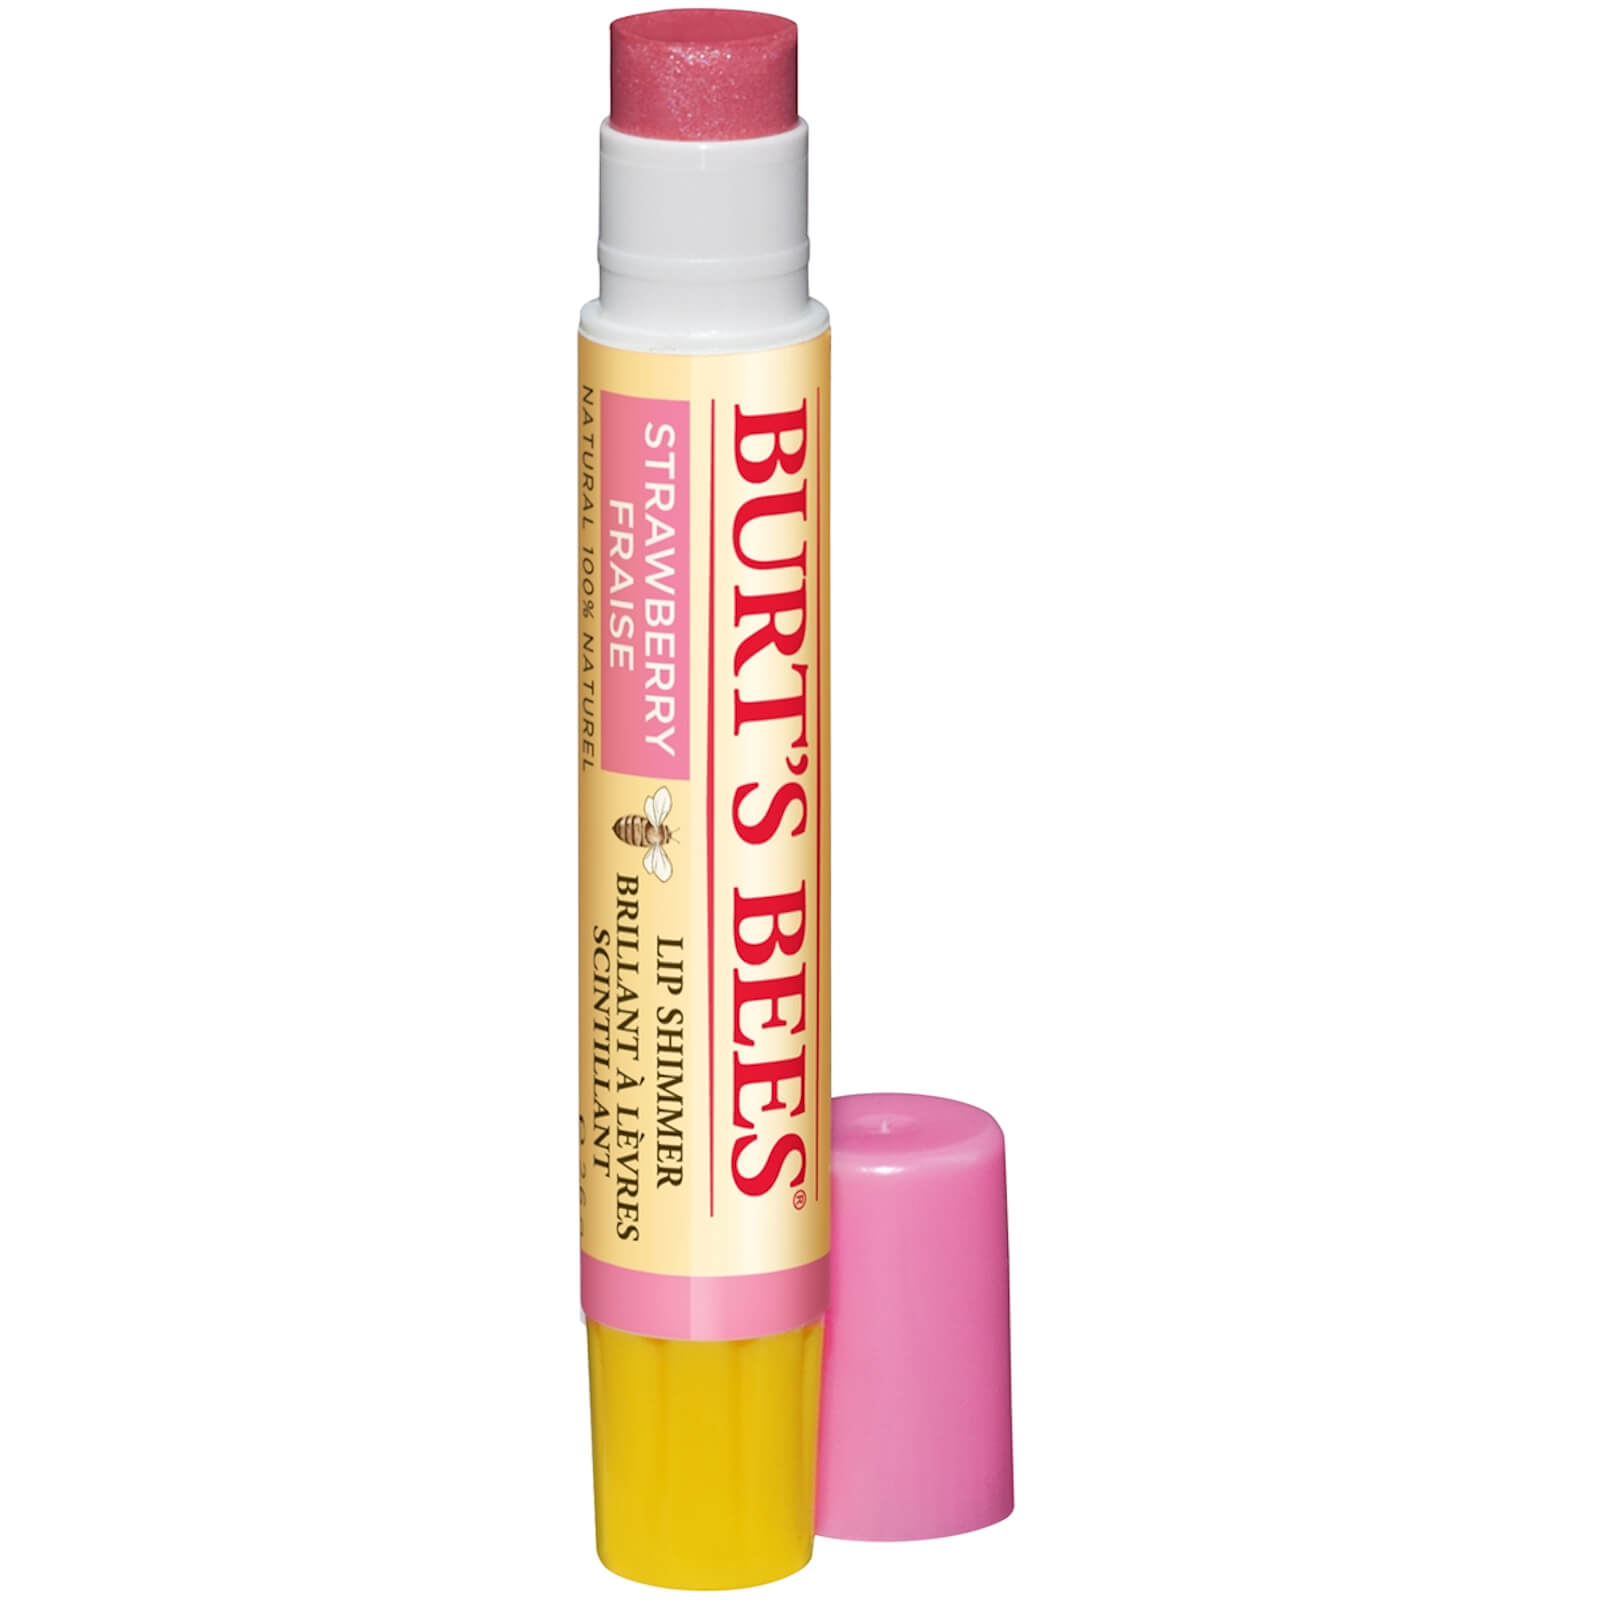 Burt's Bees Lip Shimmer 2.6g (Various Shades) - Strawberry